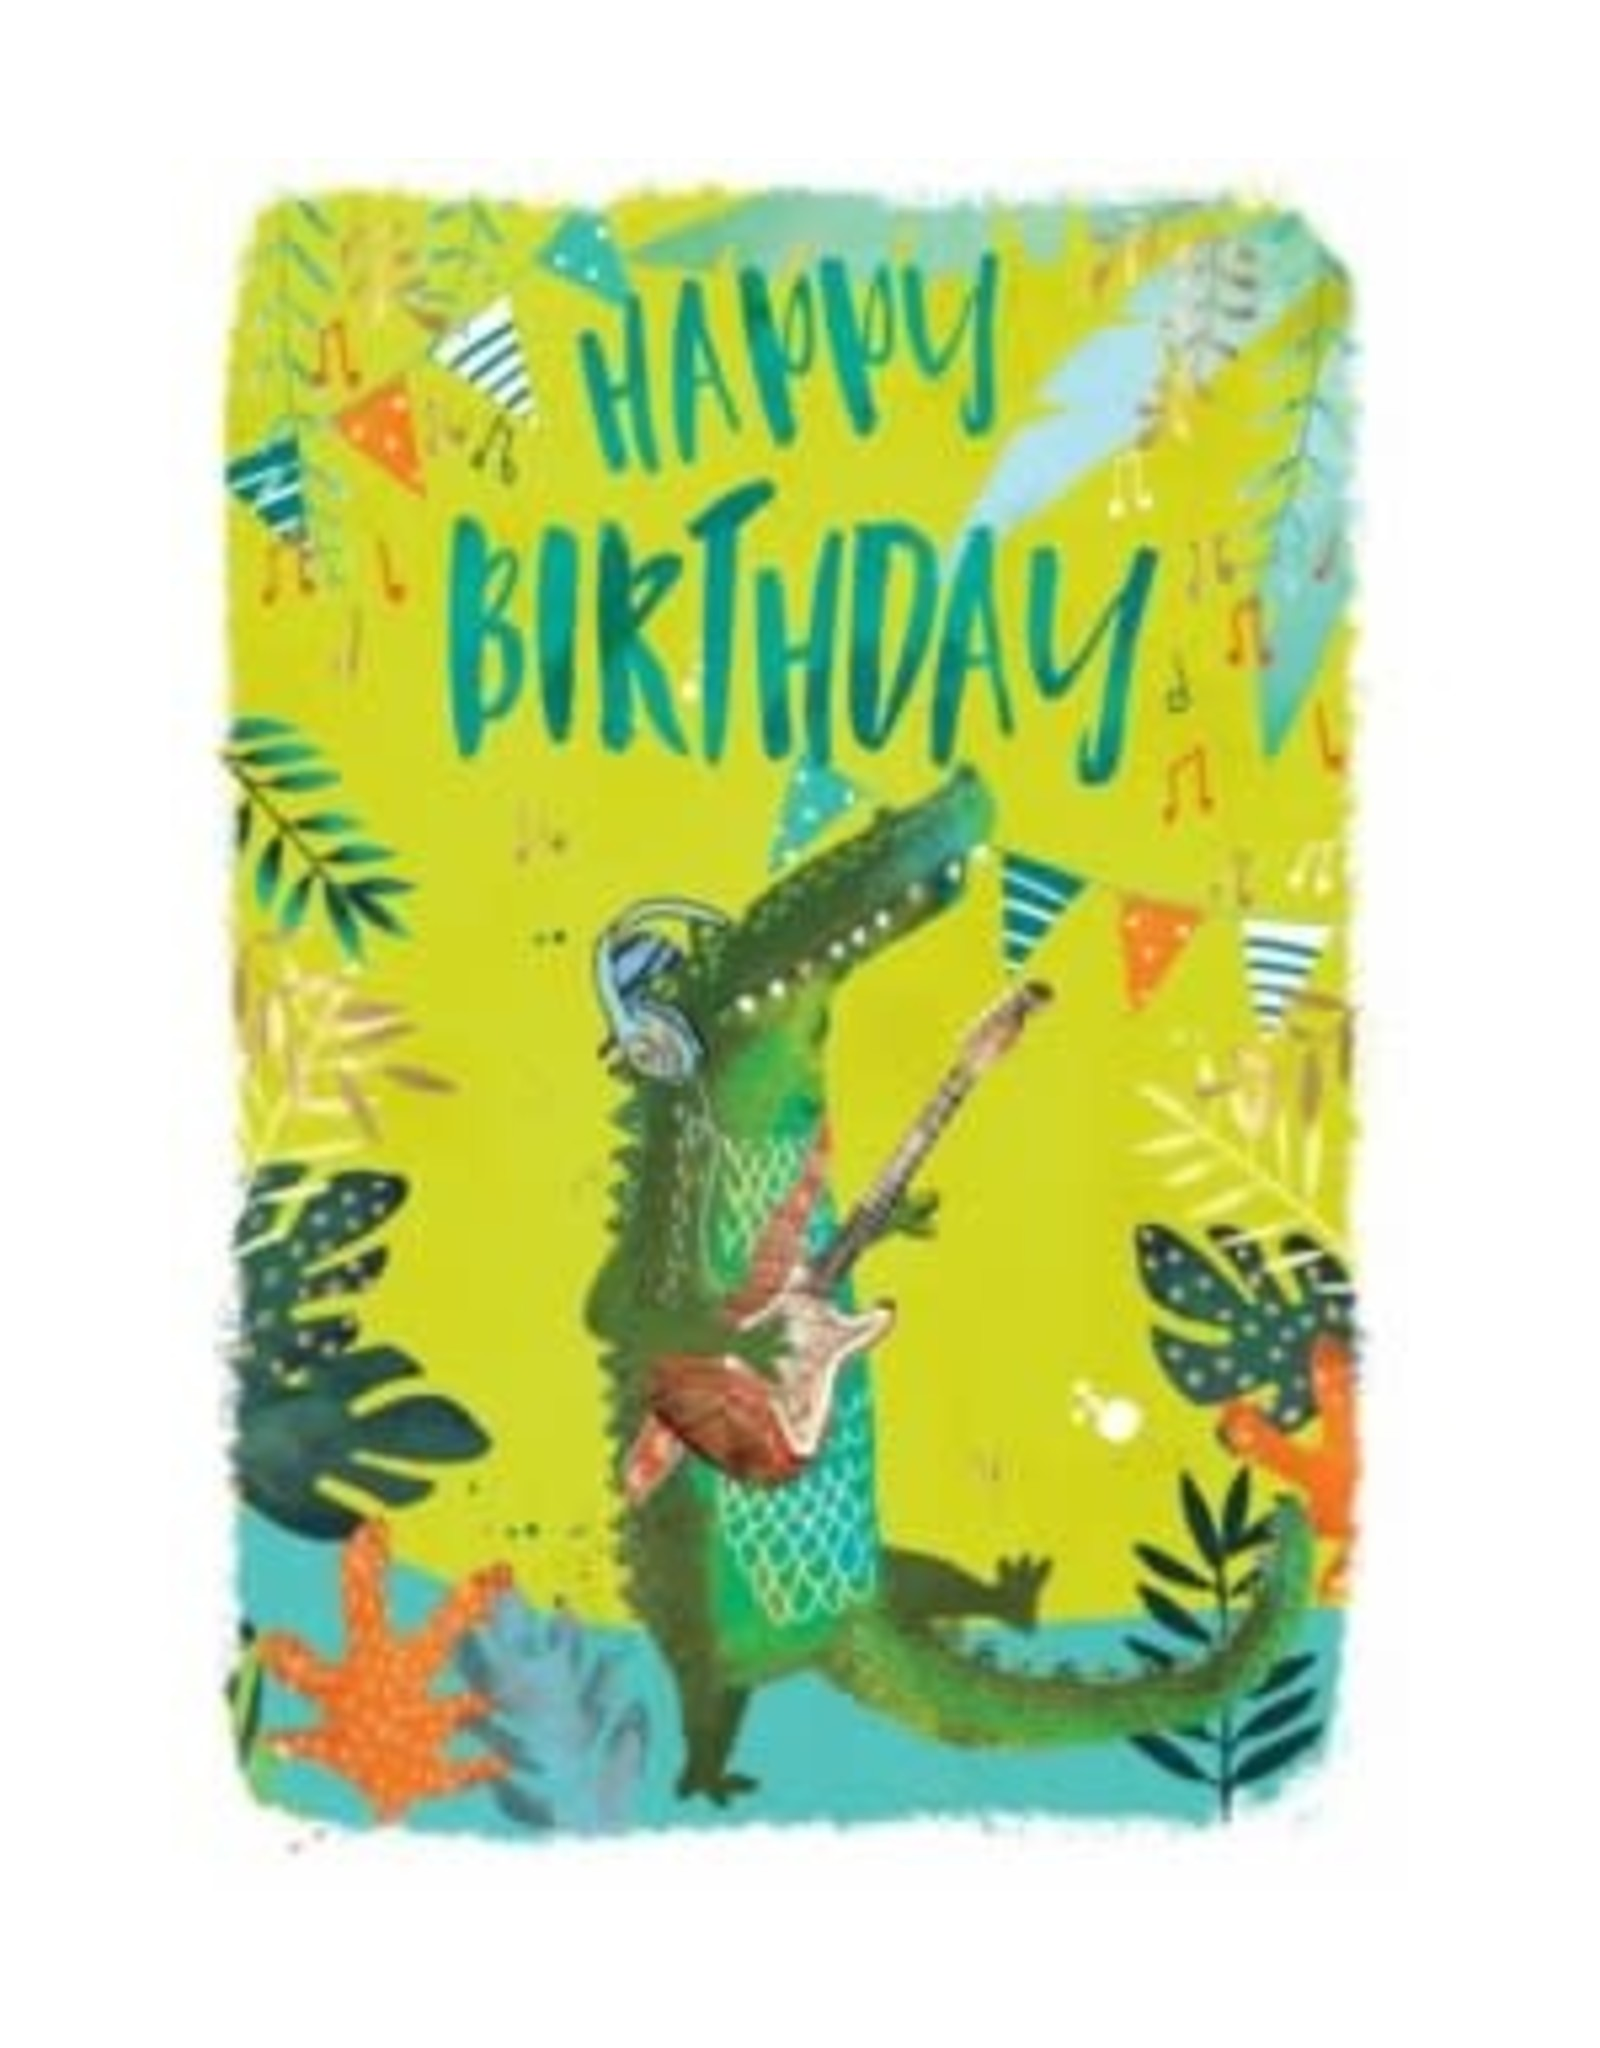 Birthday - Rocking Croc